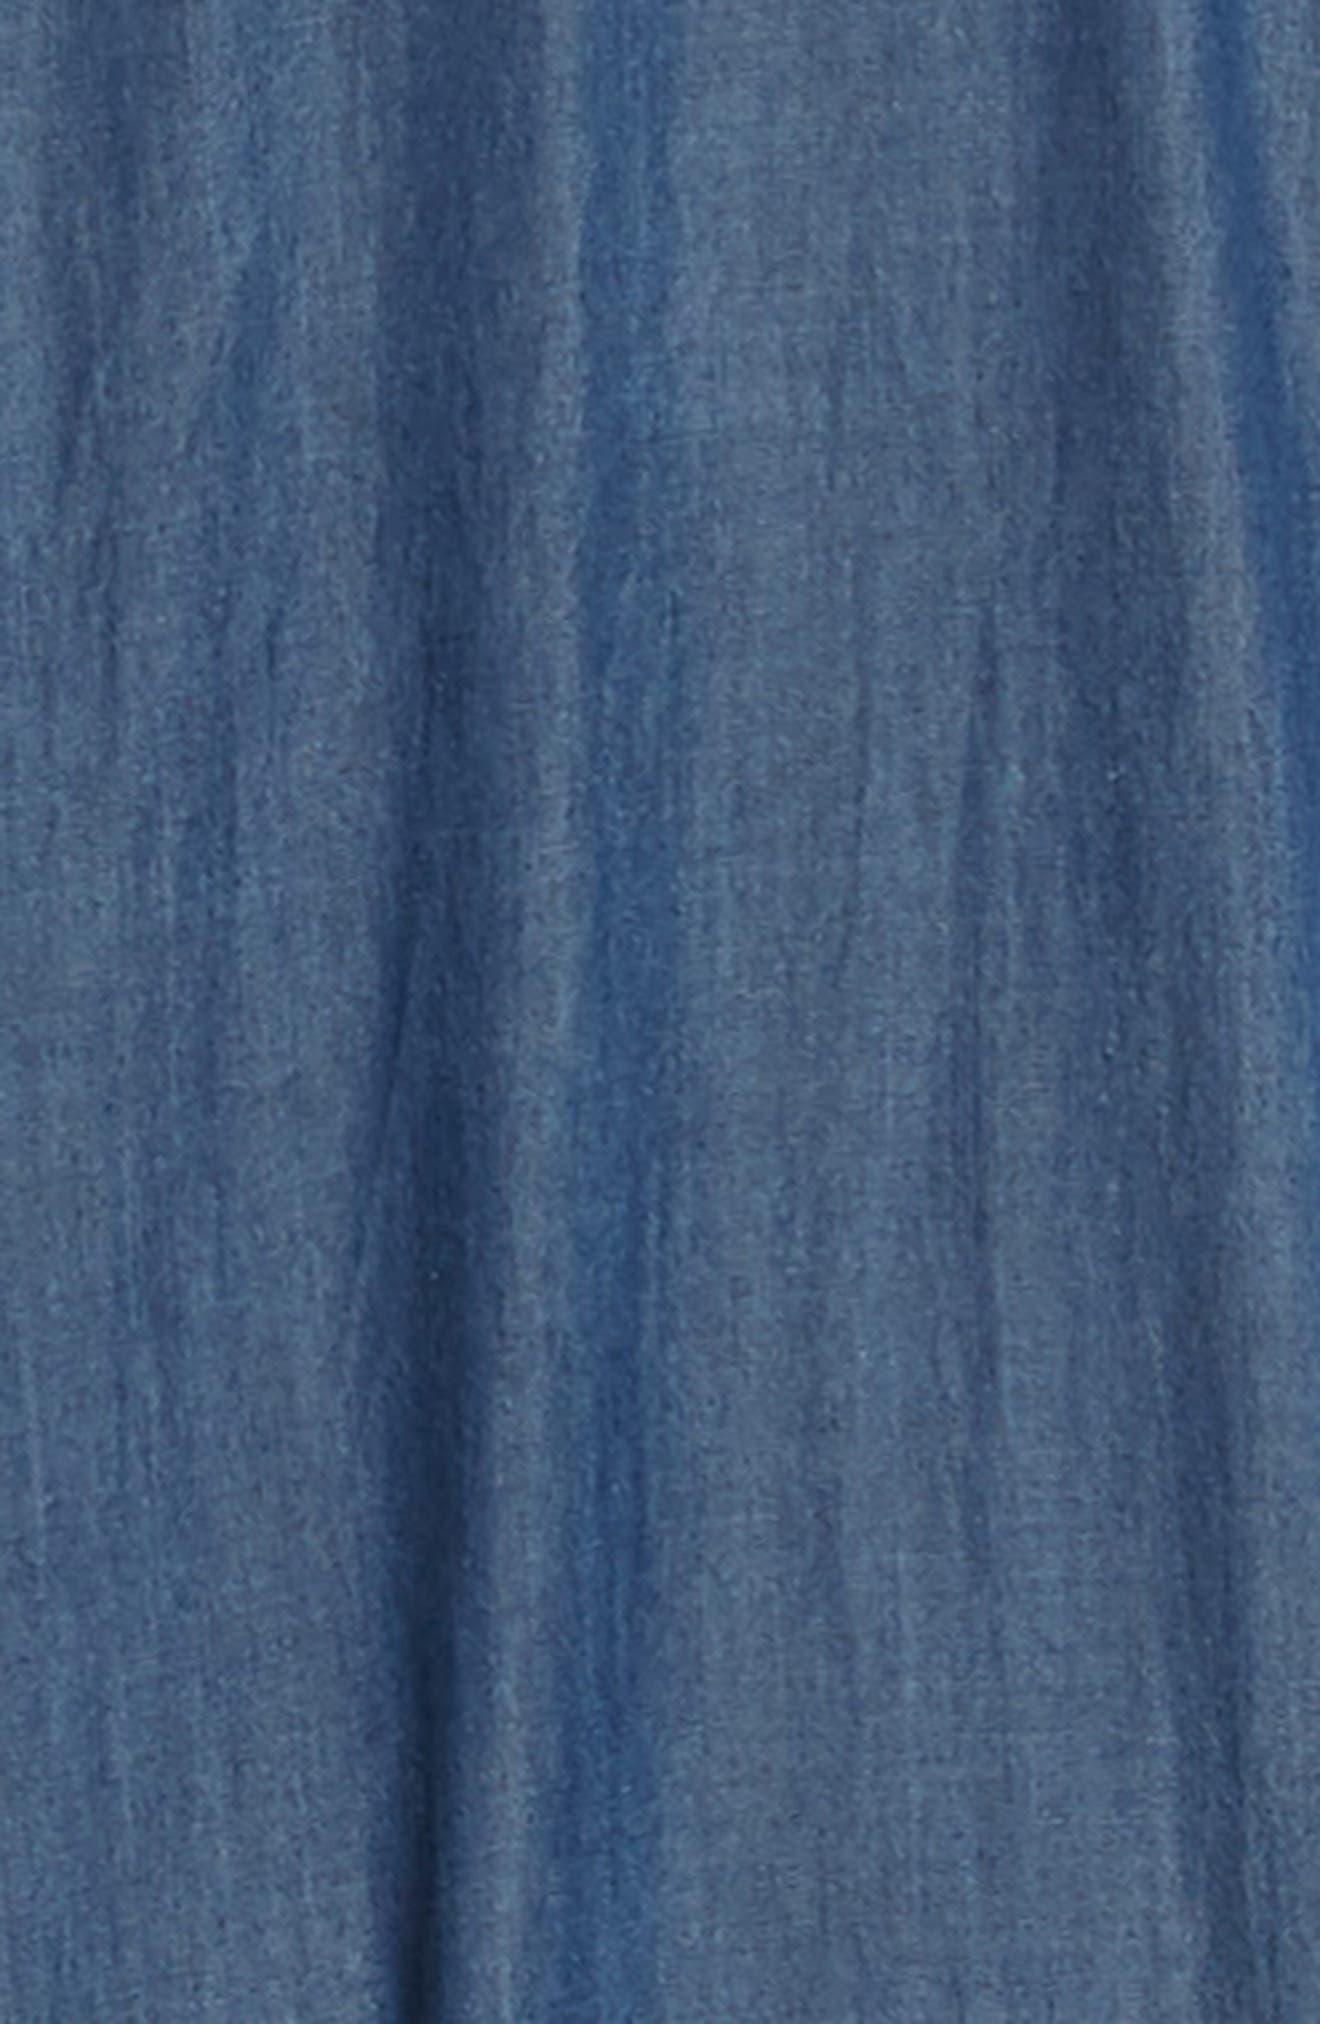 Ruffle Sleeve Denim Jumpsuit,                             Alternate thumbnail 3, color,                             420